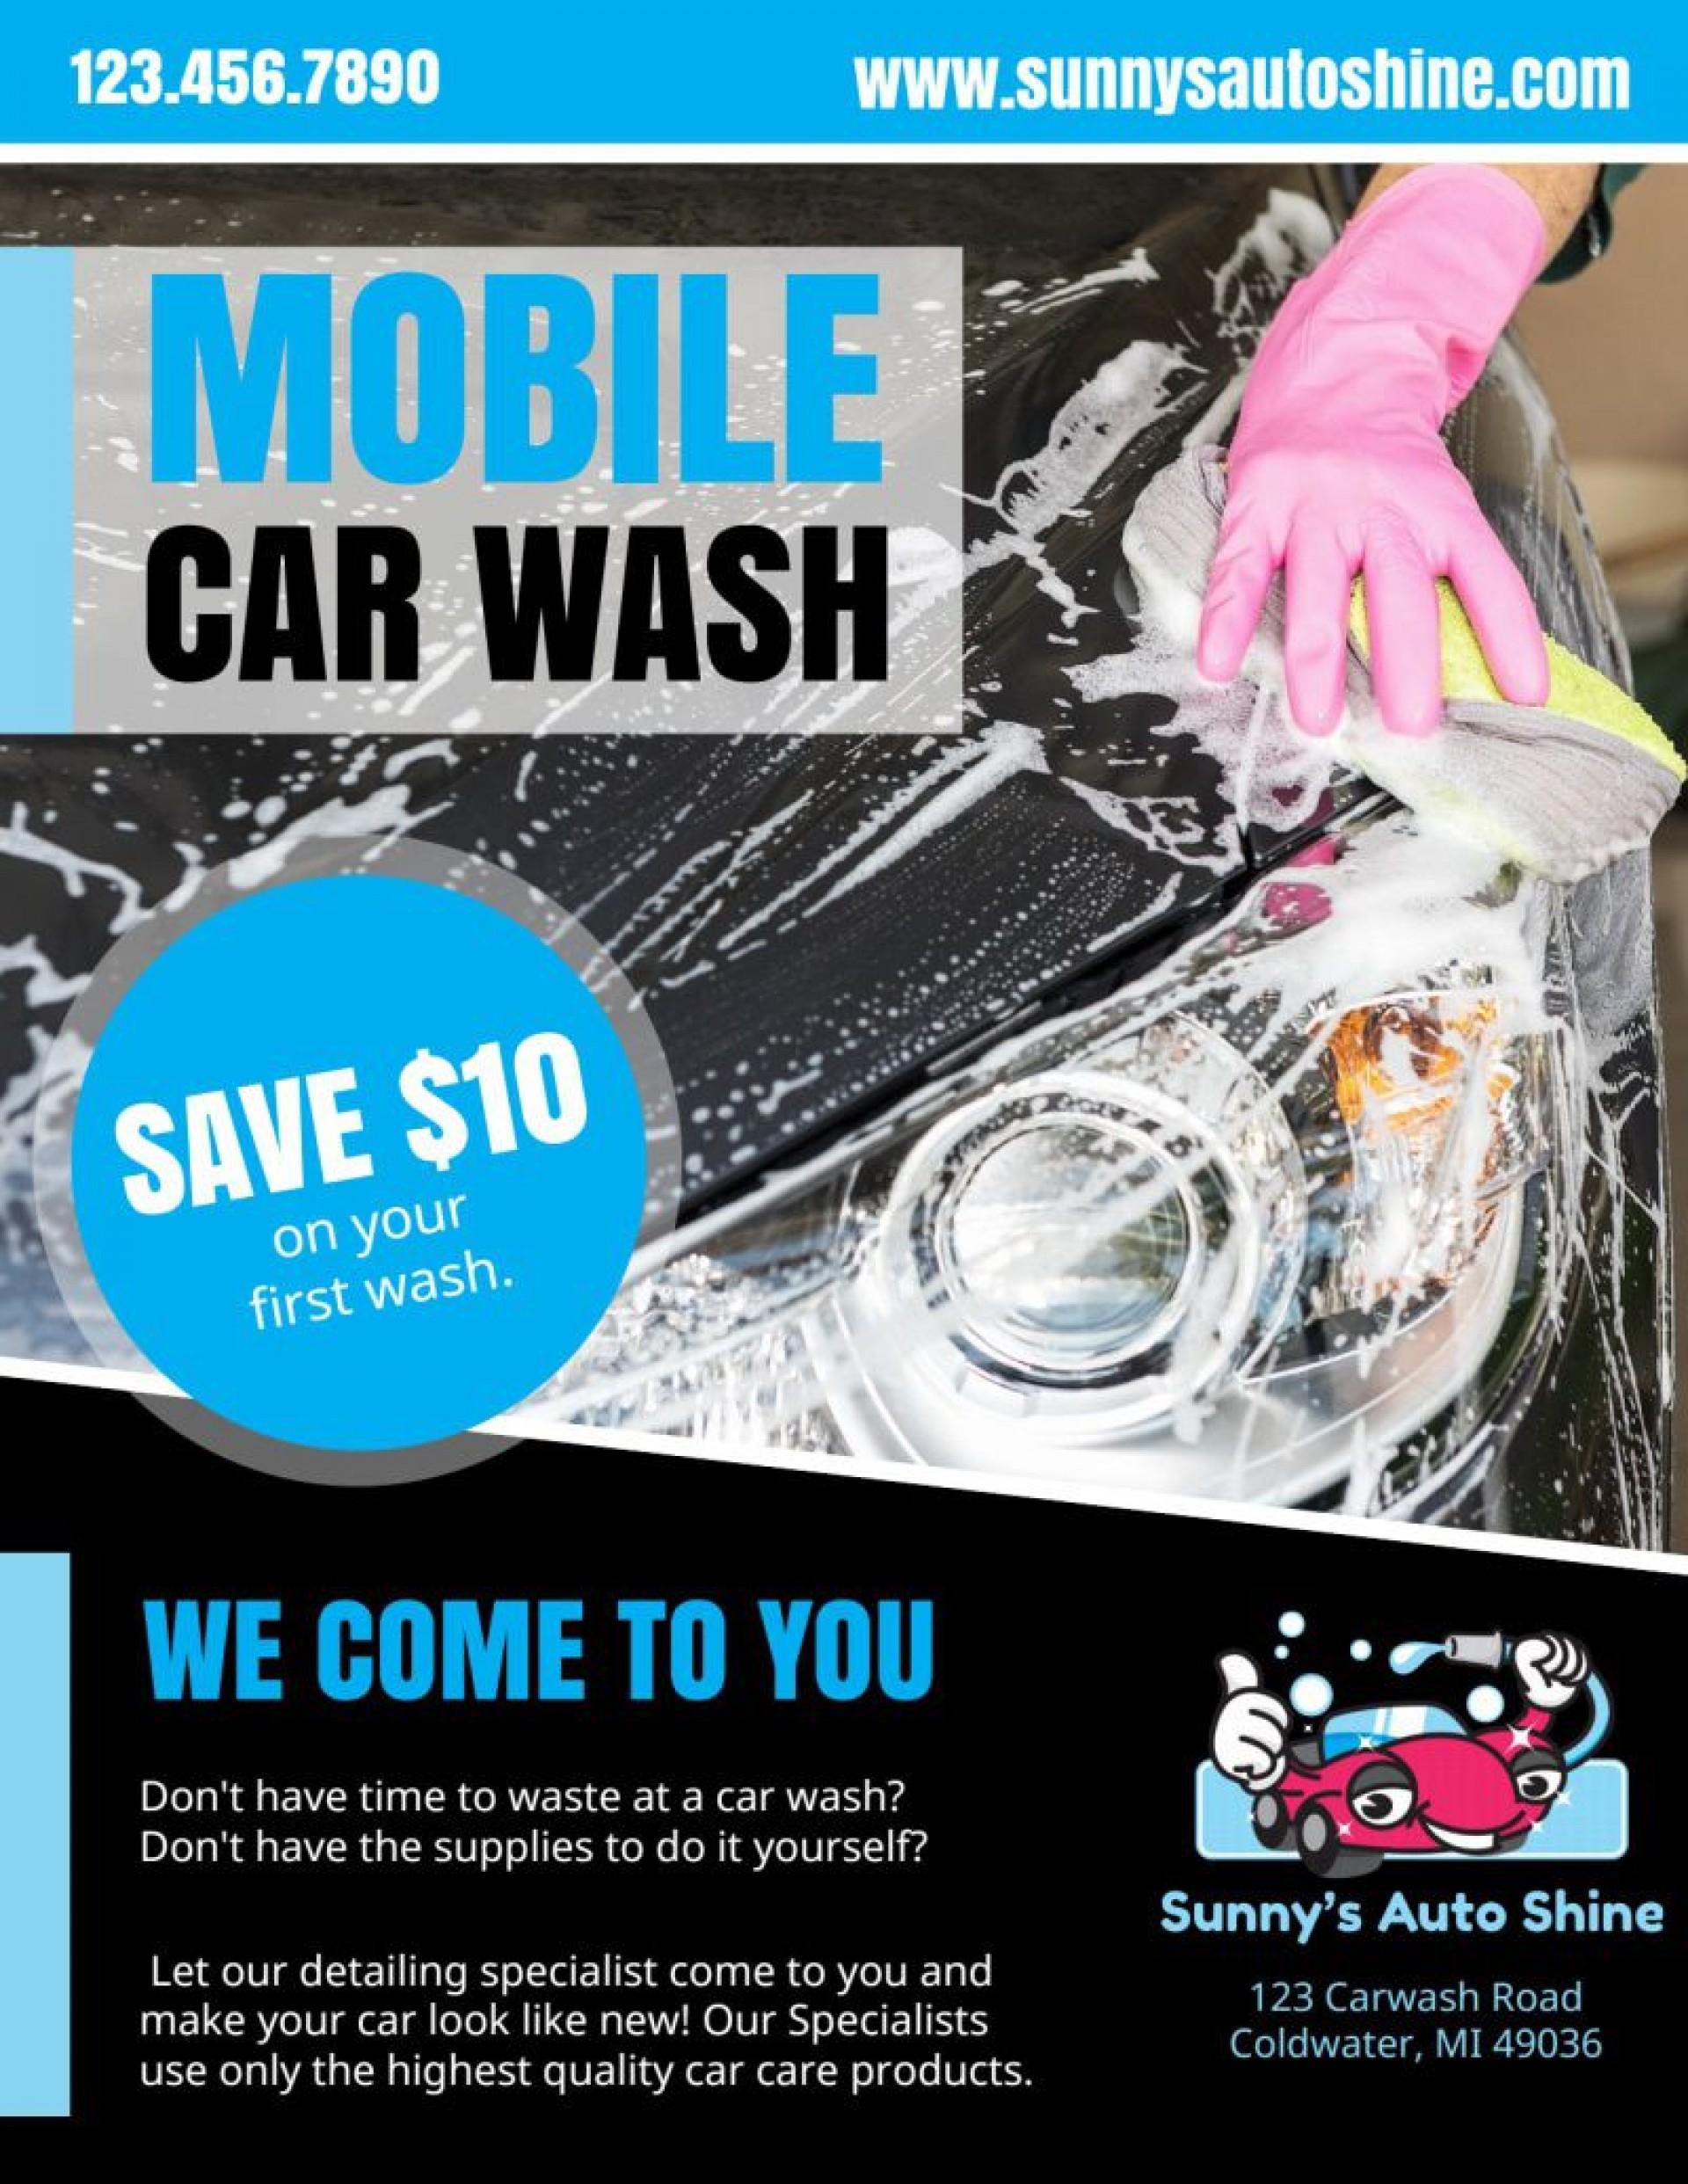 008 Excellent Car Wash Flyer Template Concept  Free Fundraiser Download1920